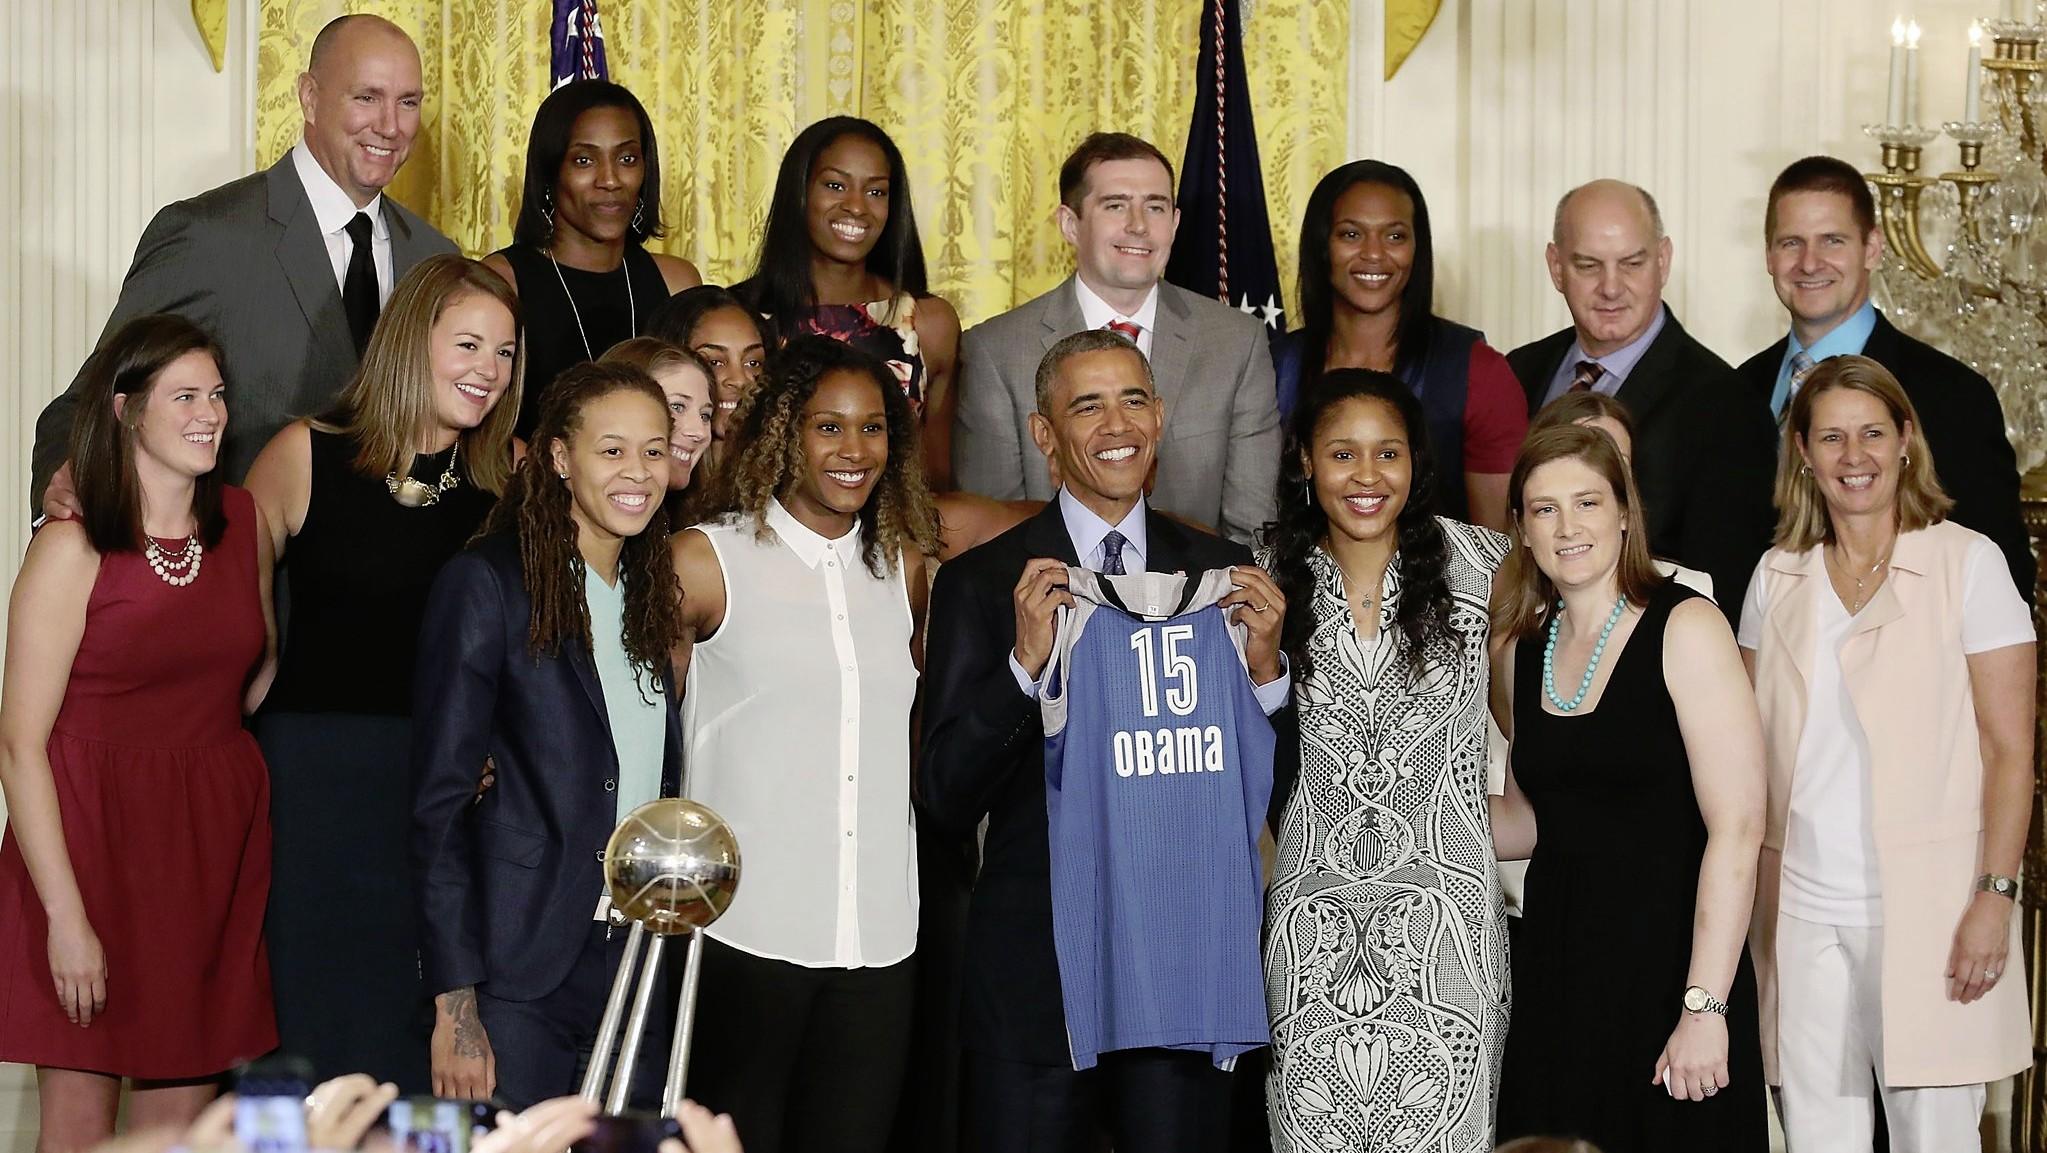 Video: President Barack Obama honors the 2015 WNBA champion Minnesota Lynx at the White House